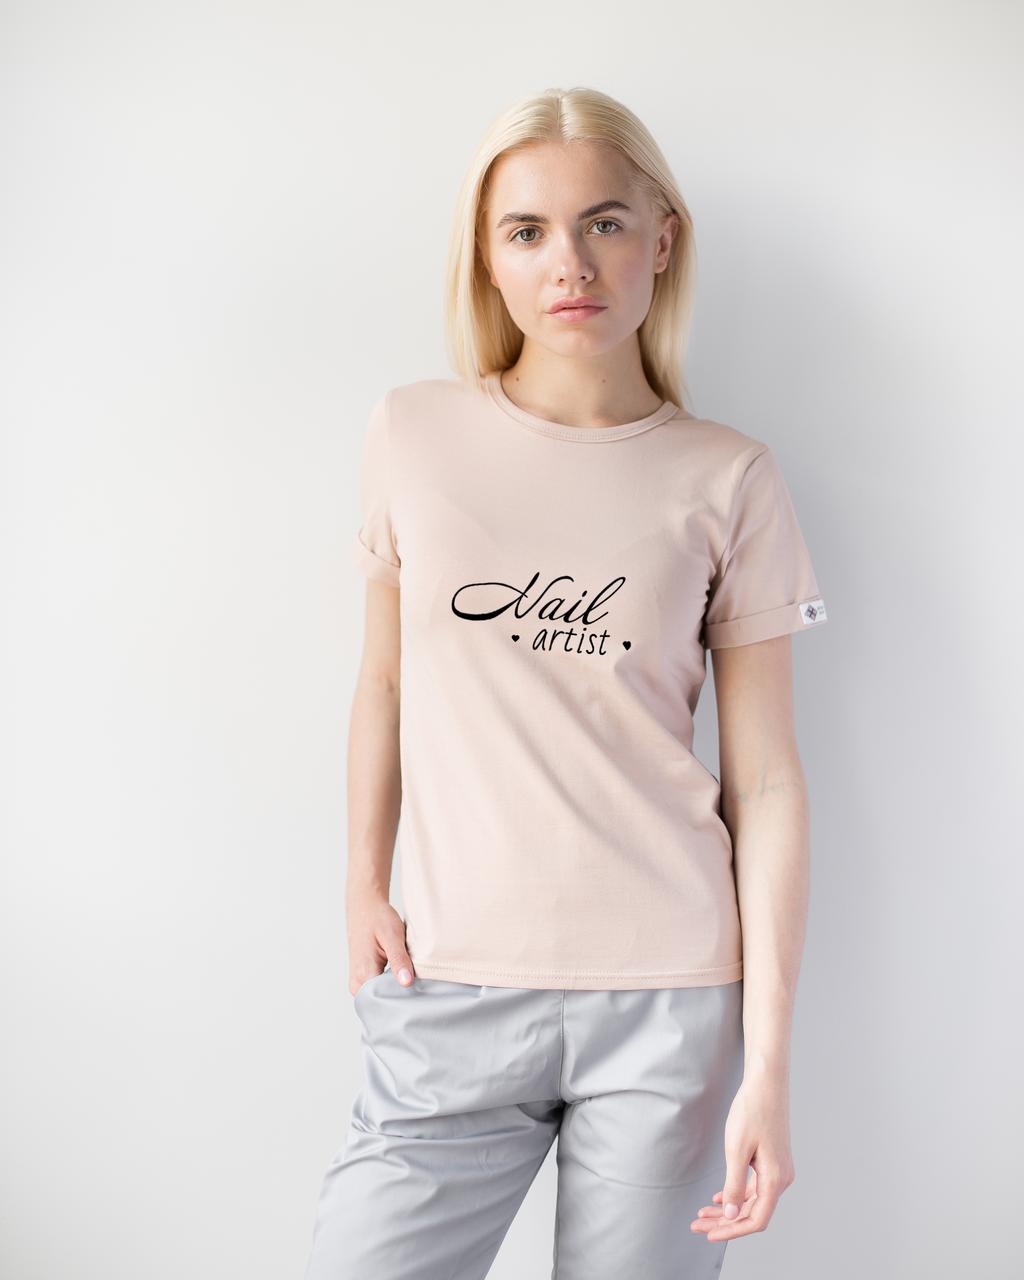 Женская футболка Модерн, беж принт Nail artist